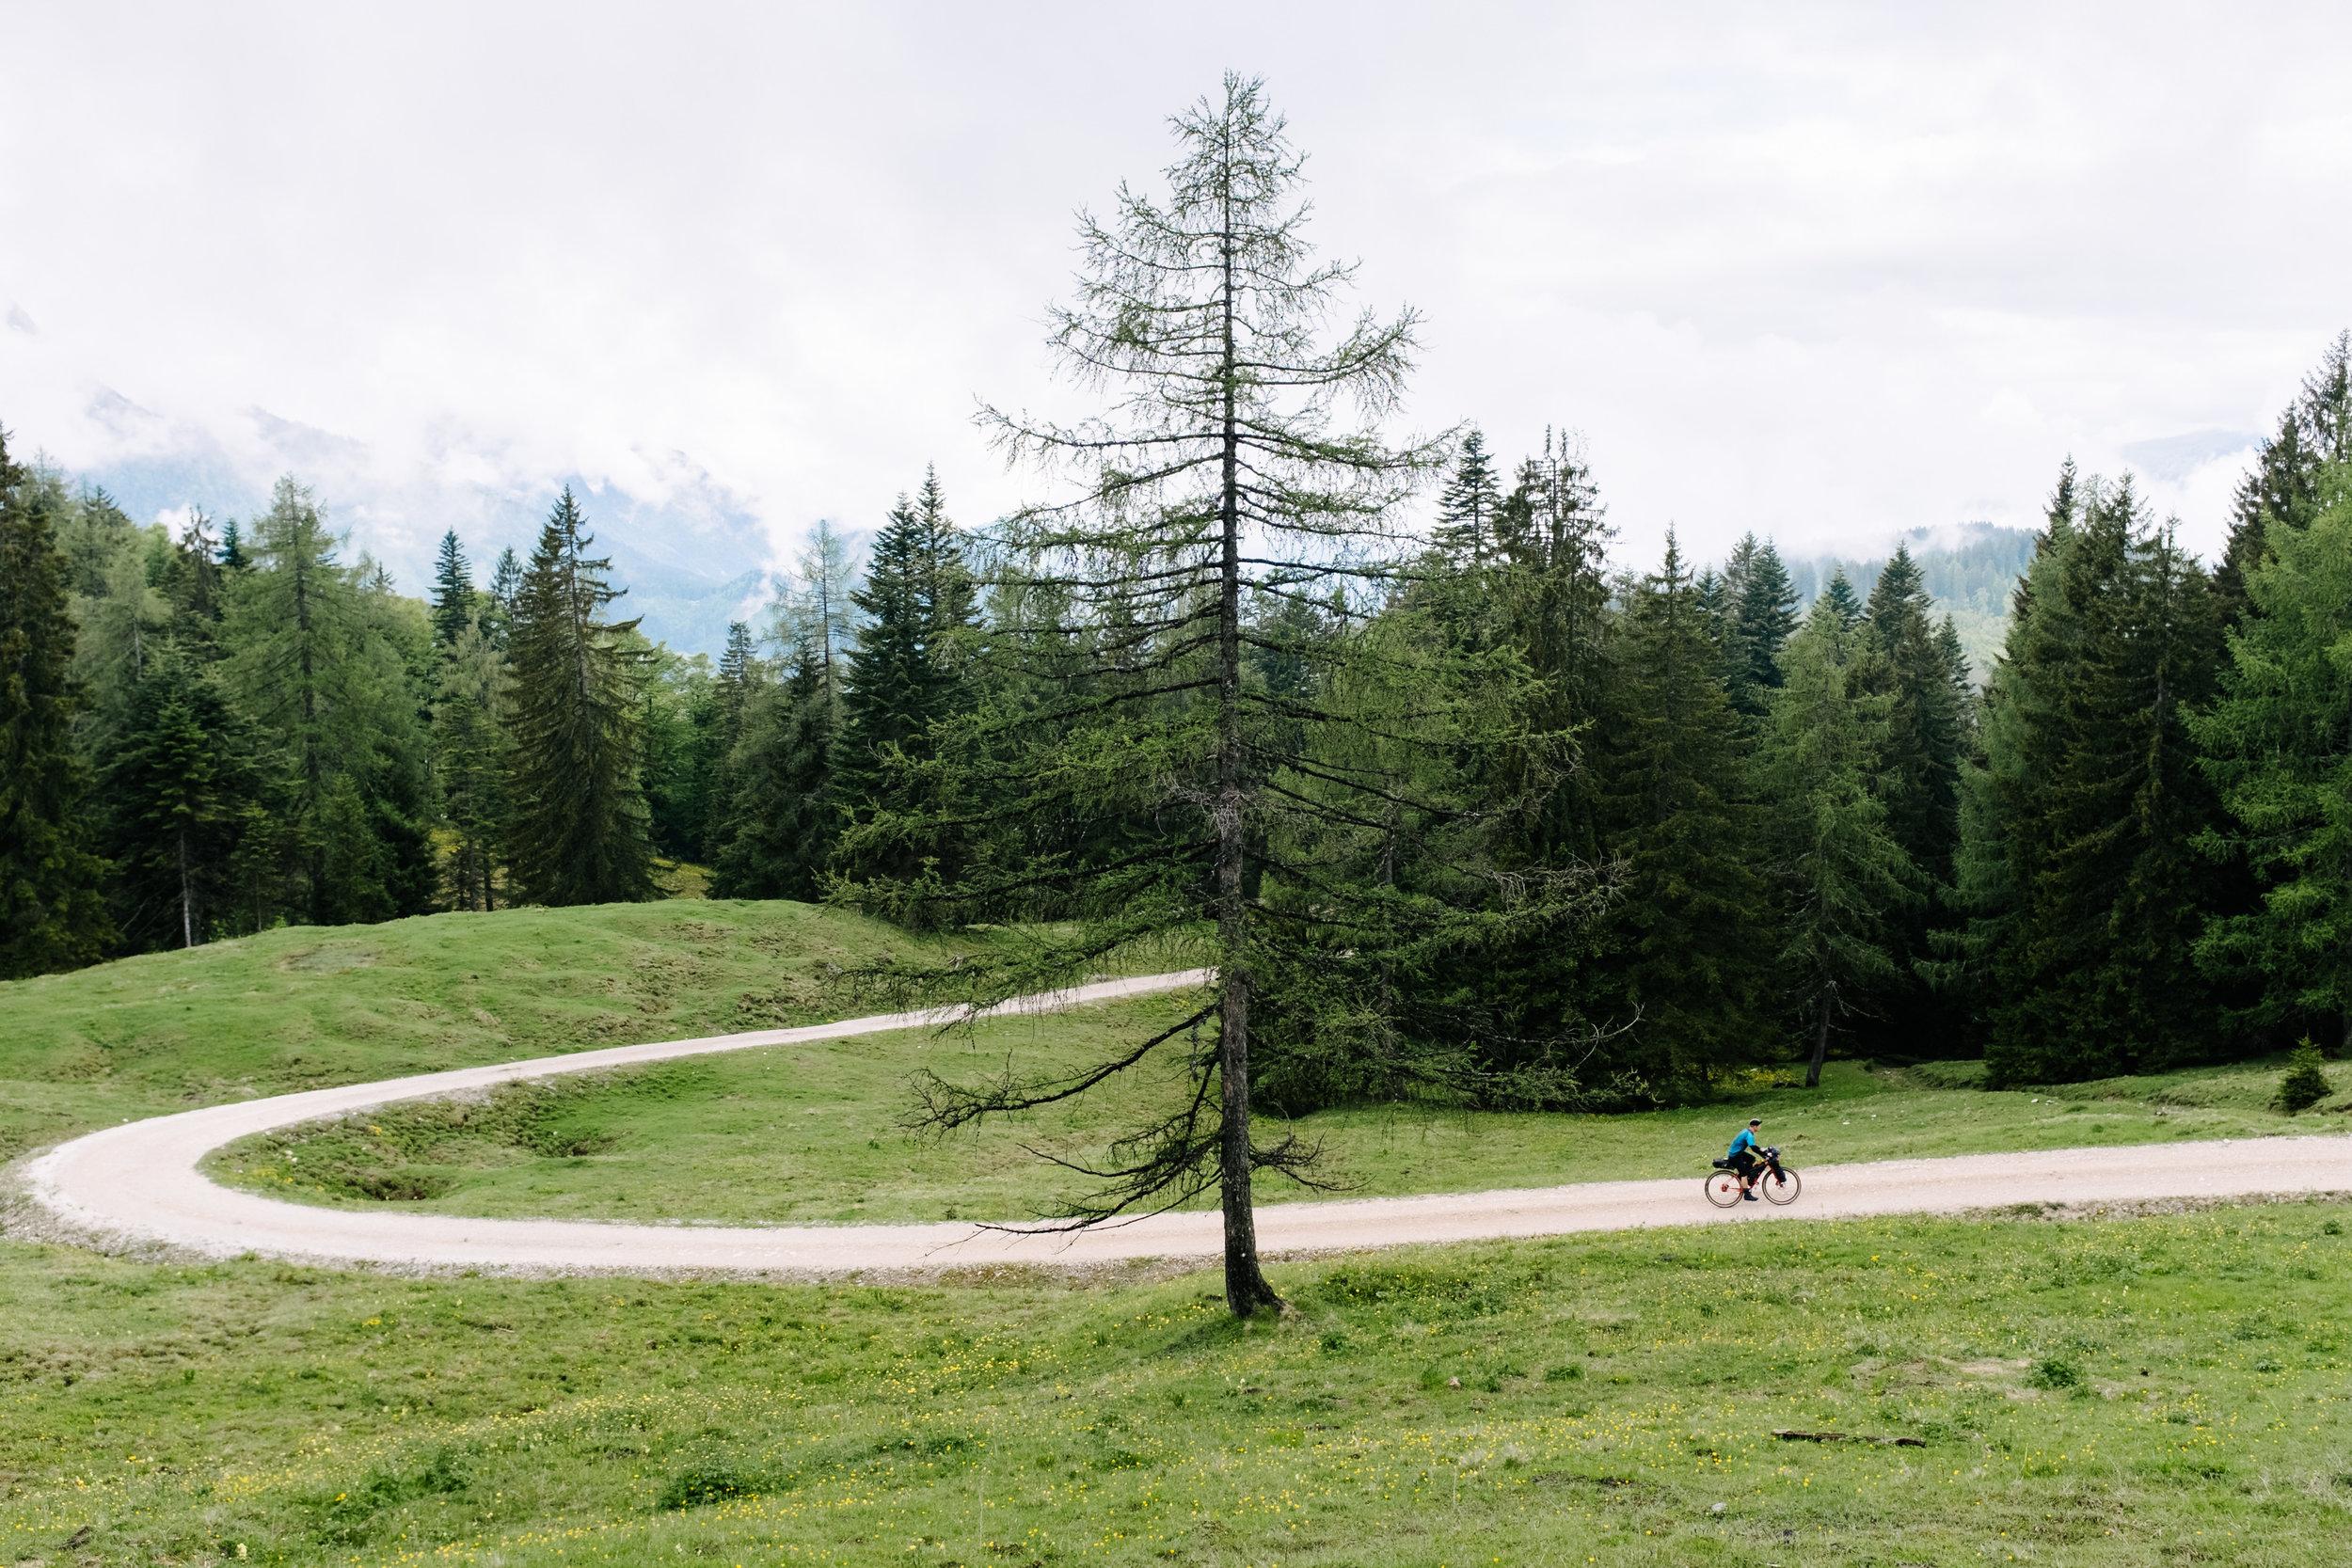 BenReadPhotography_Bikepacking-10.jpg